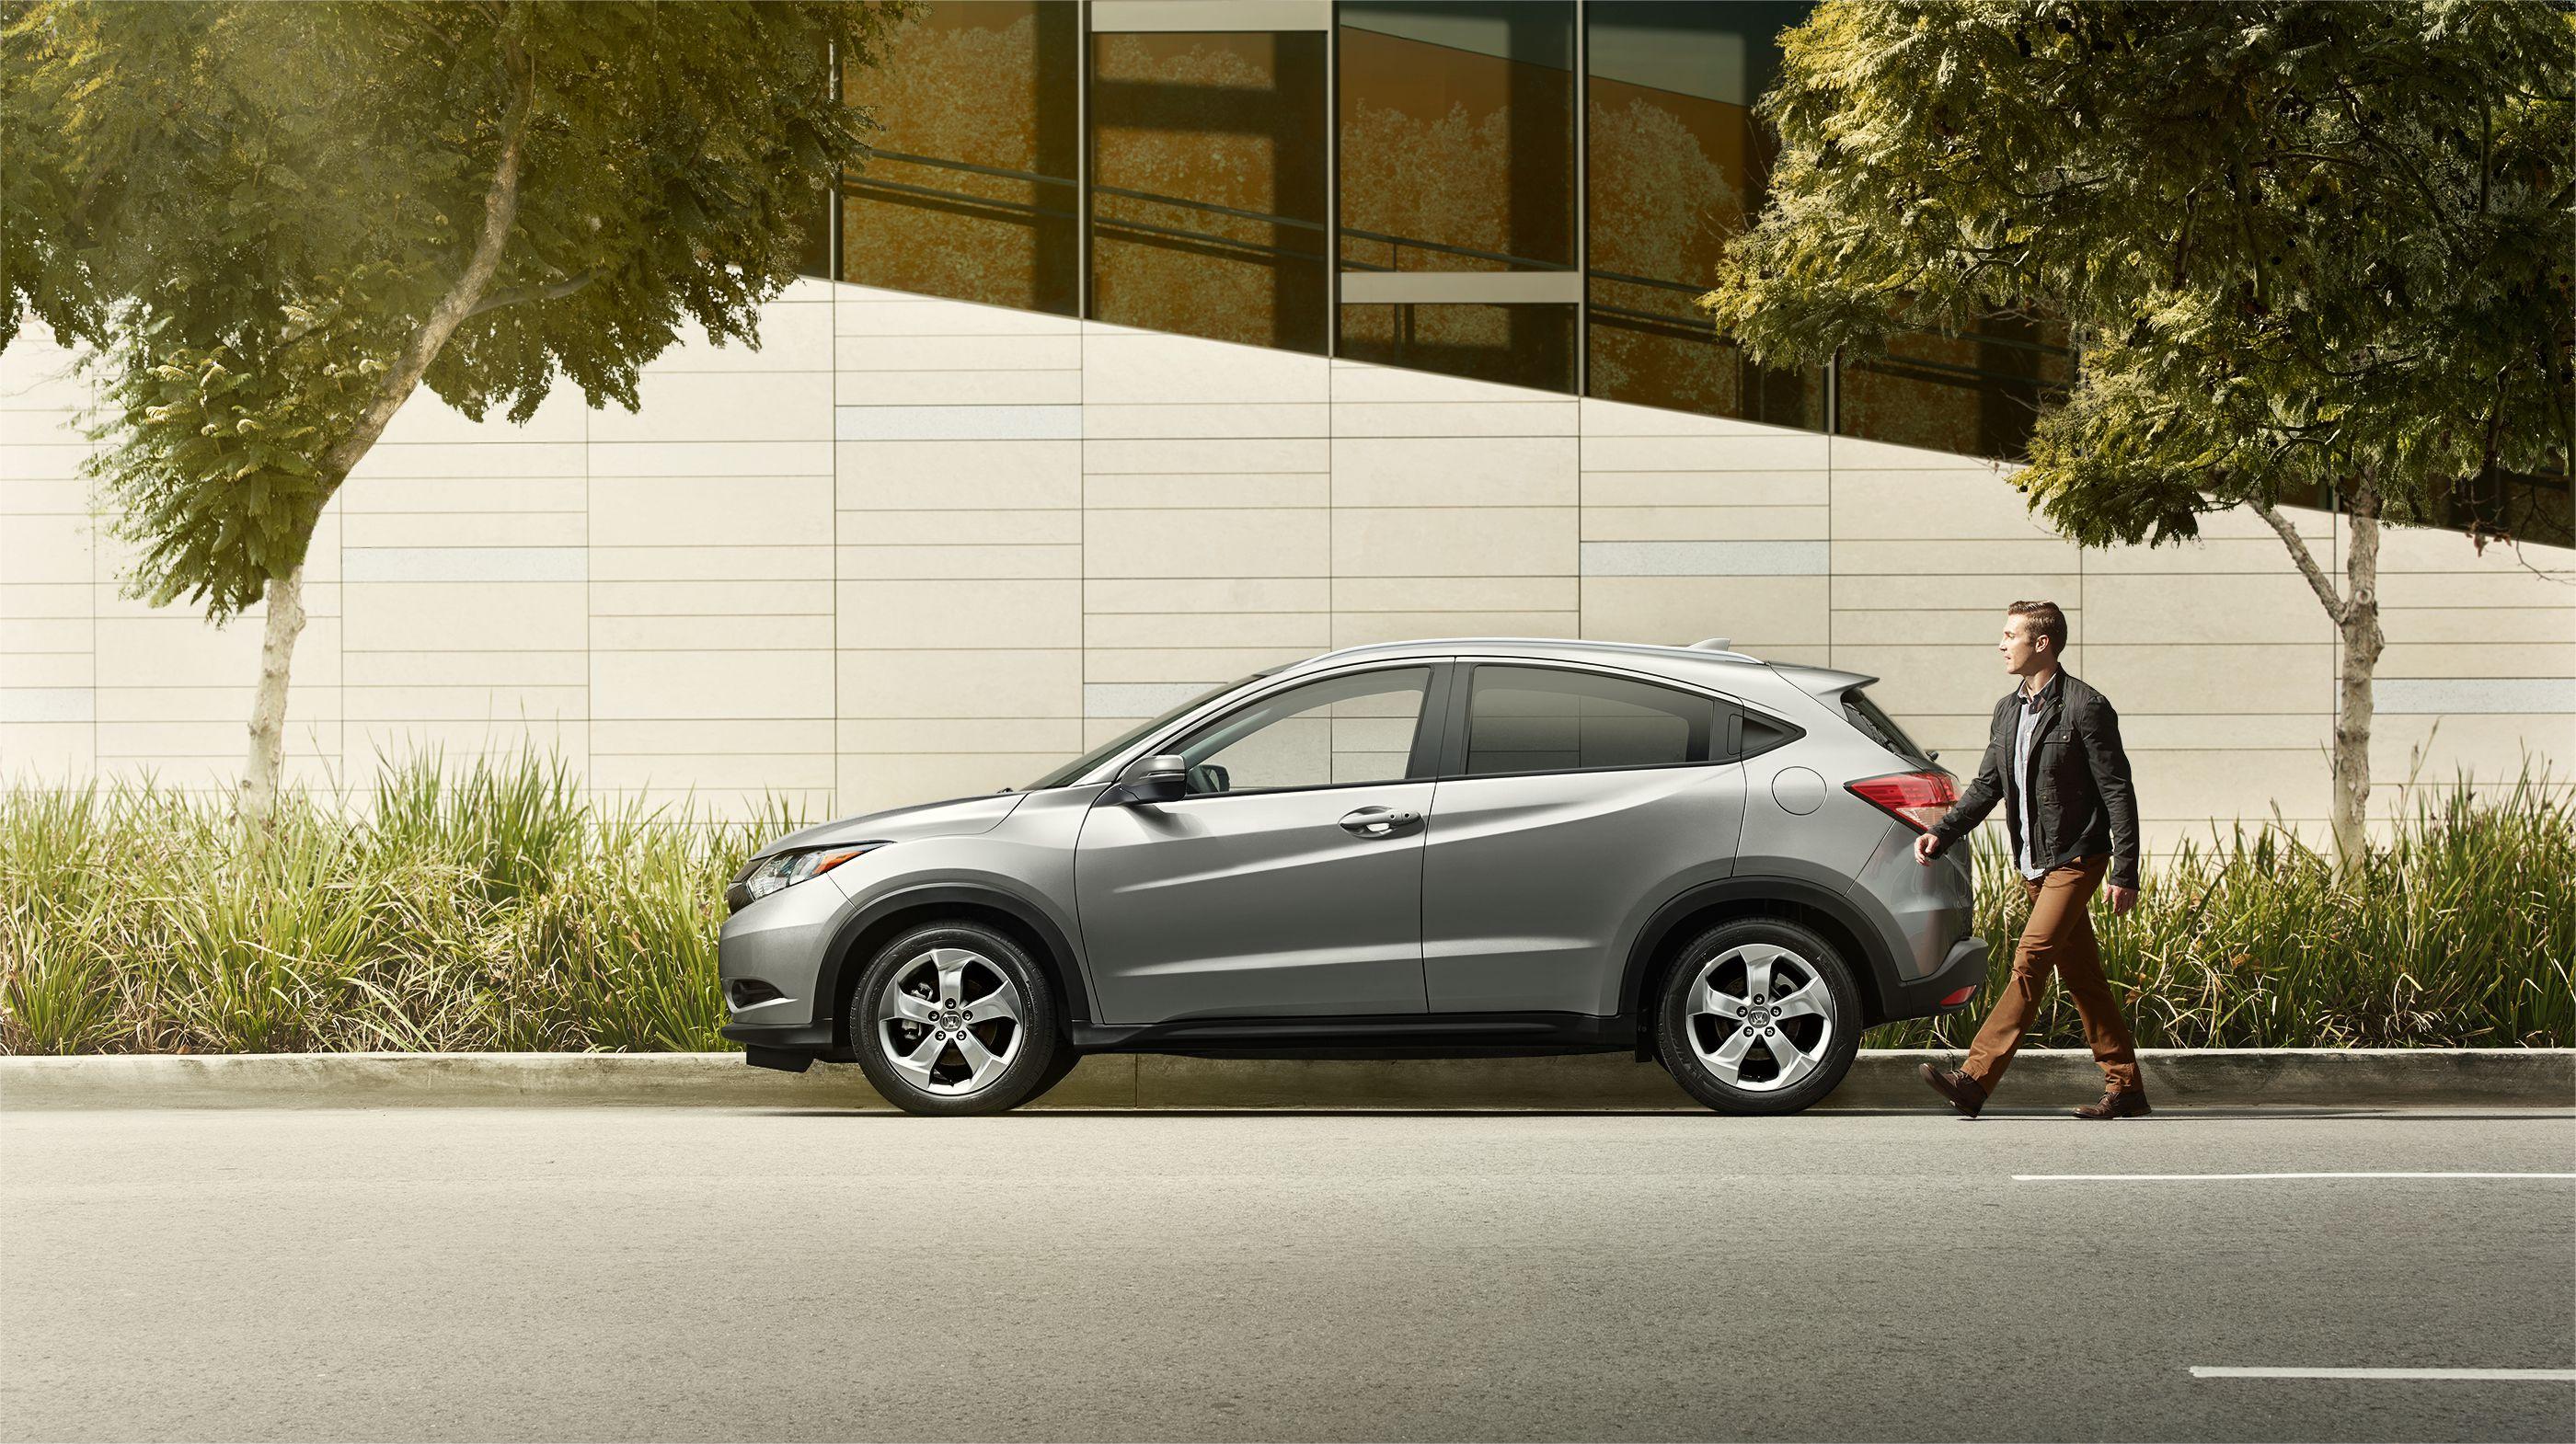 New Honda HR V On Sale Now At Honda Of Ames